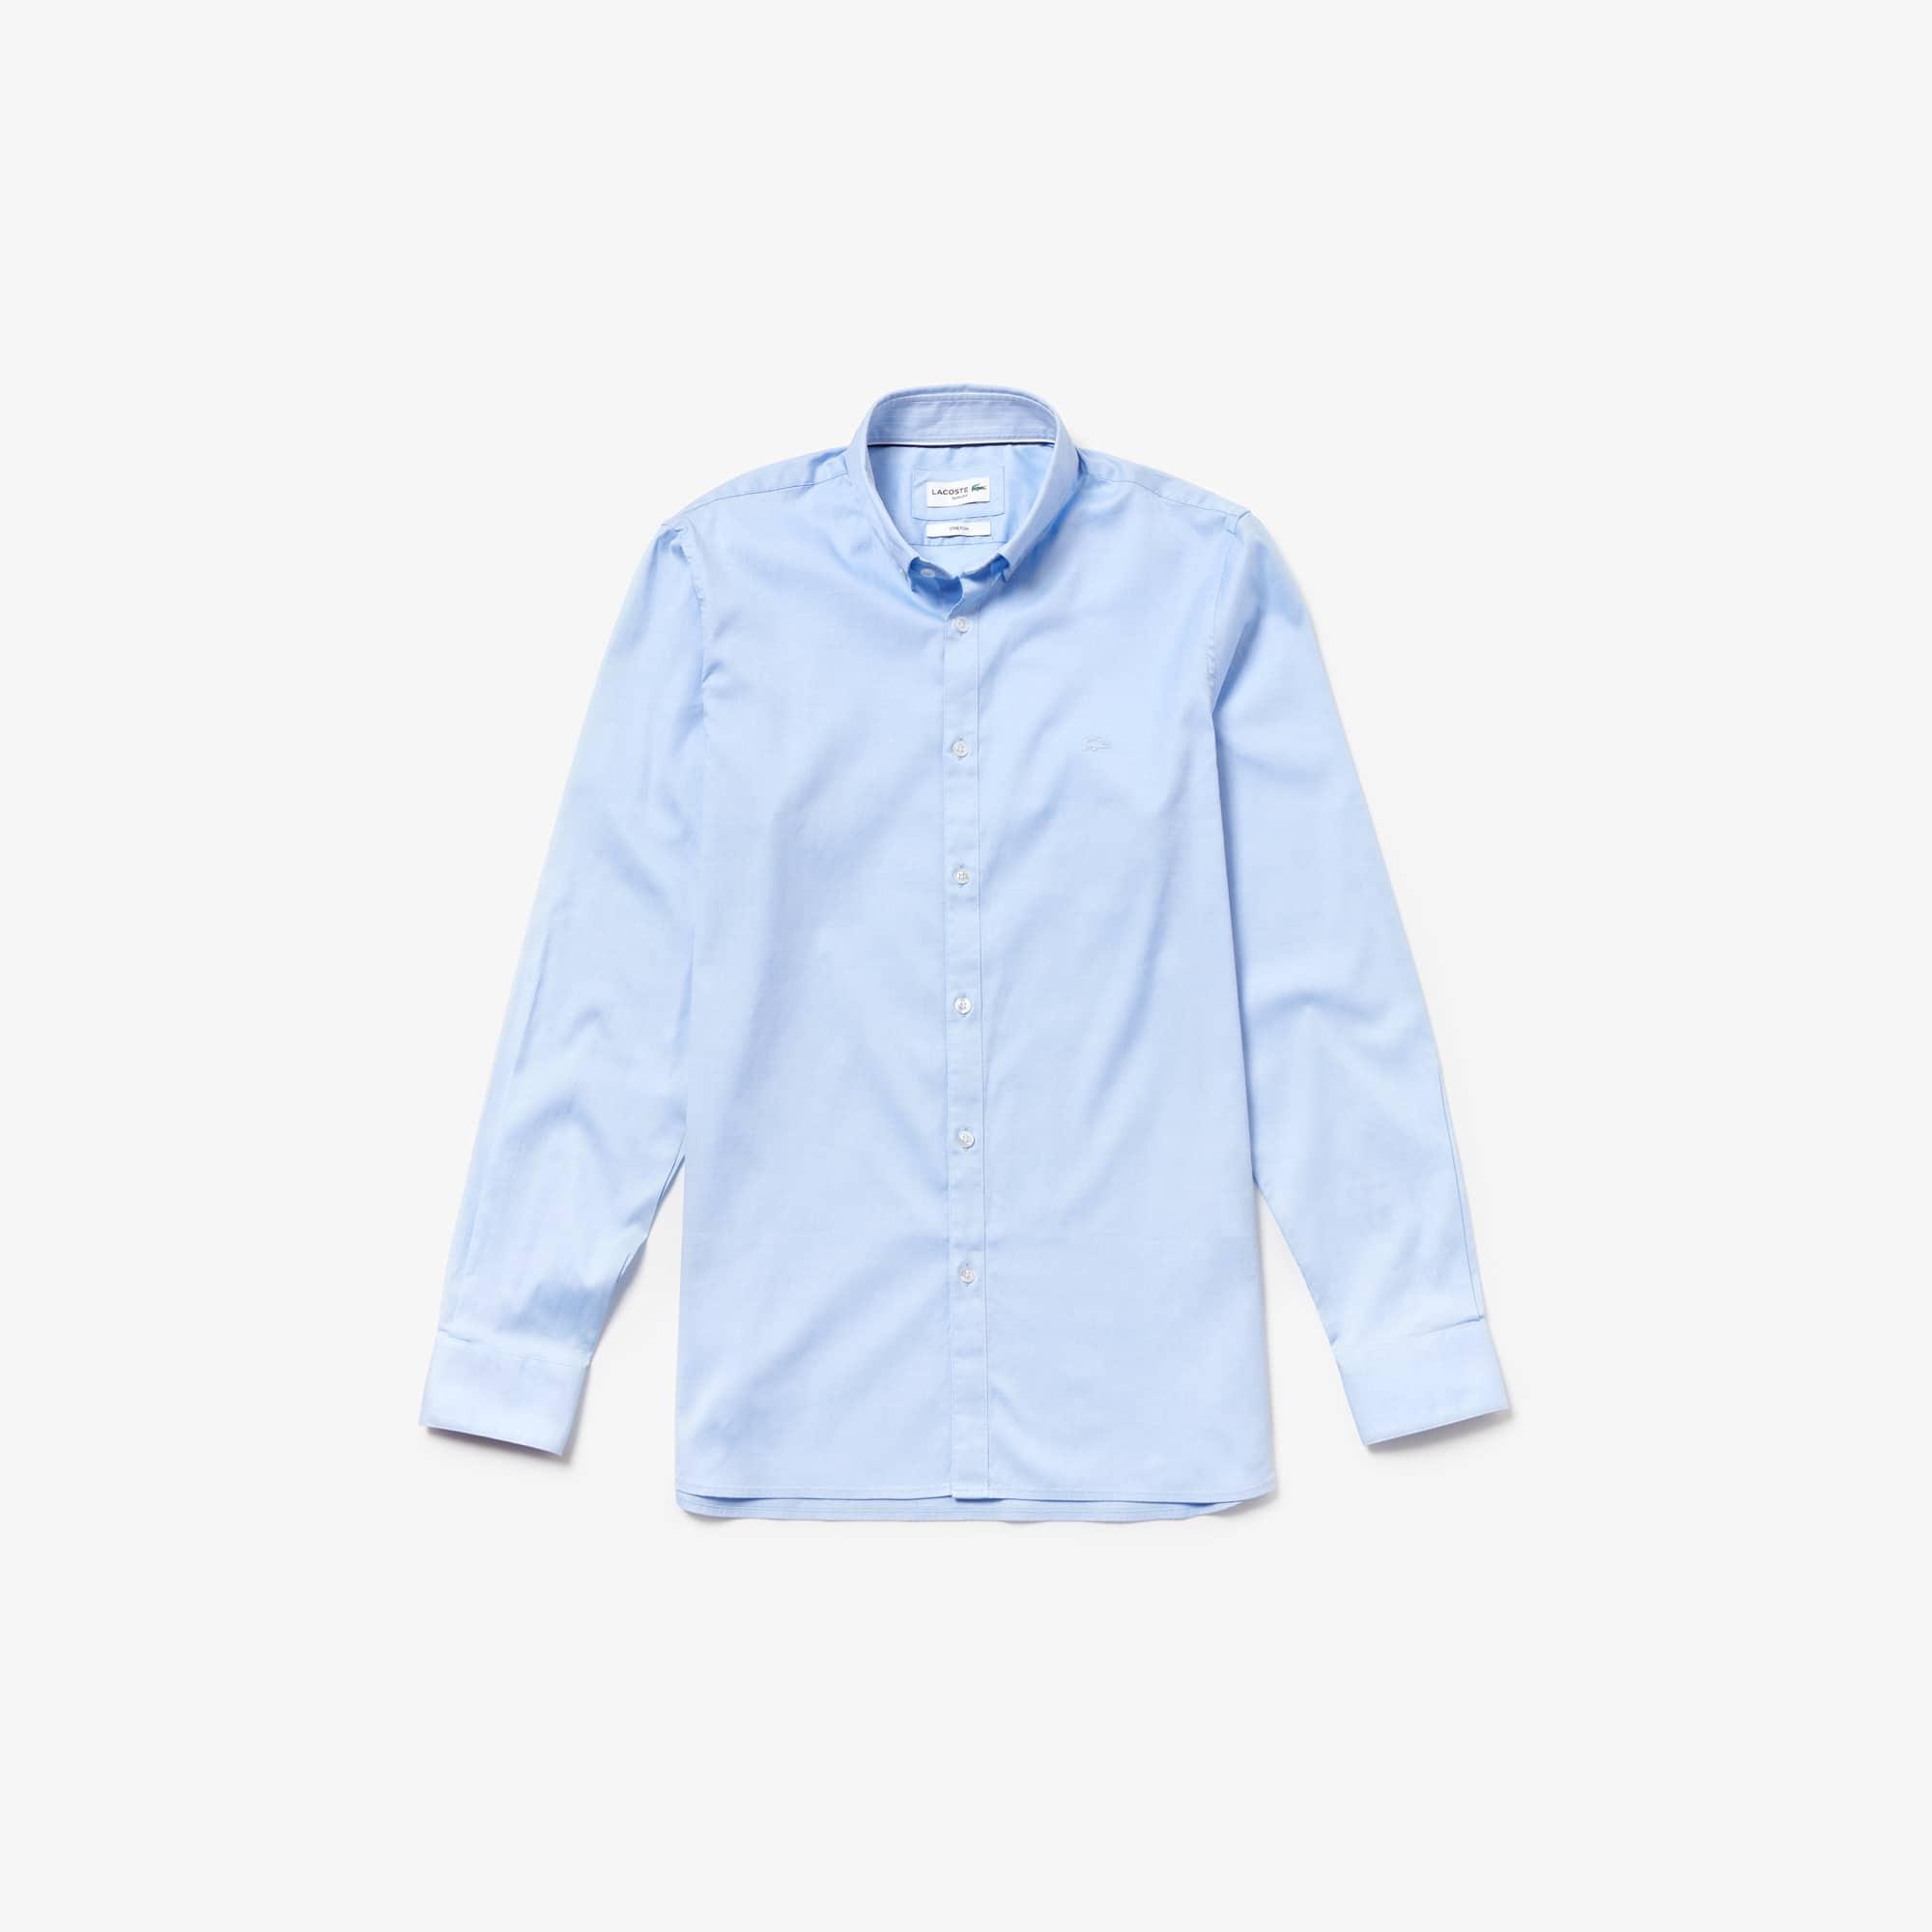 Shirt heren Slim Fit stretch pinpointkatoen